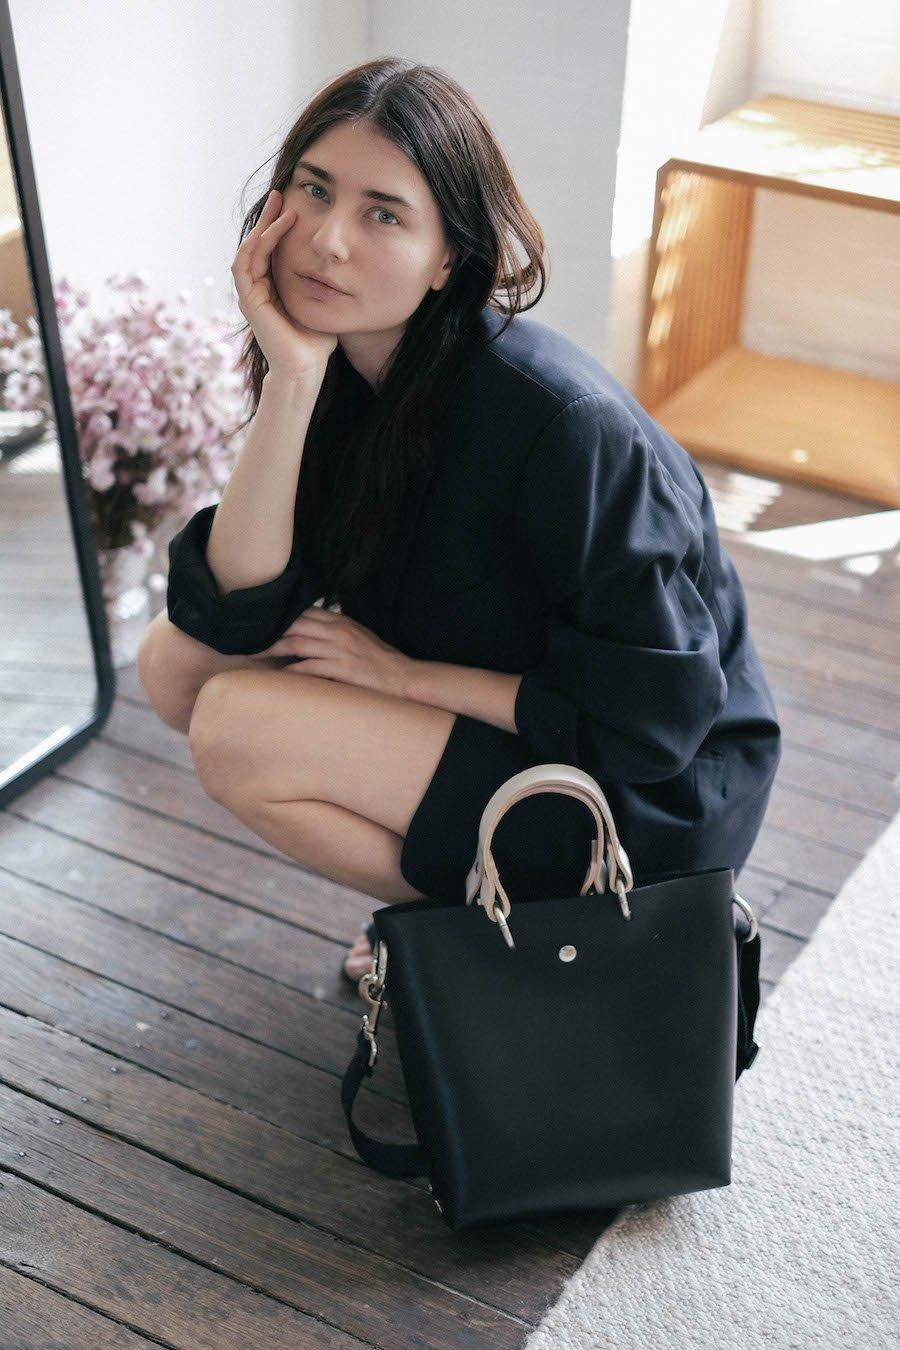 Katya Komarova posing with one of her pieces